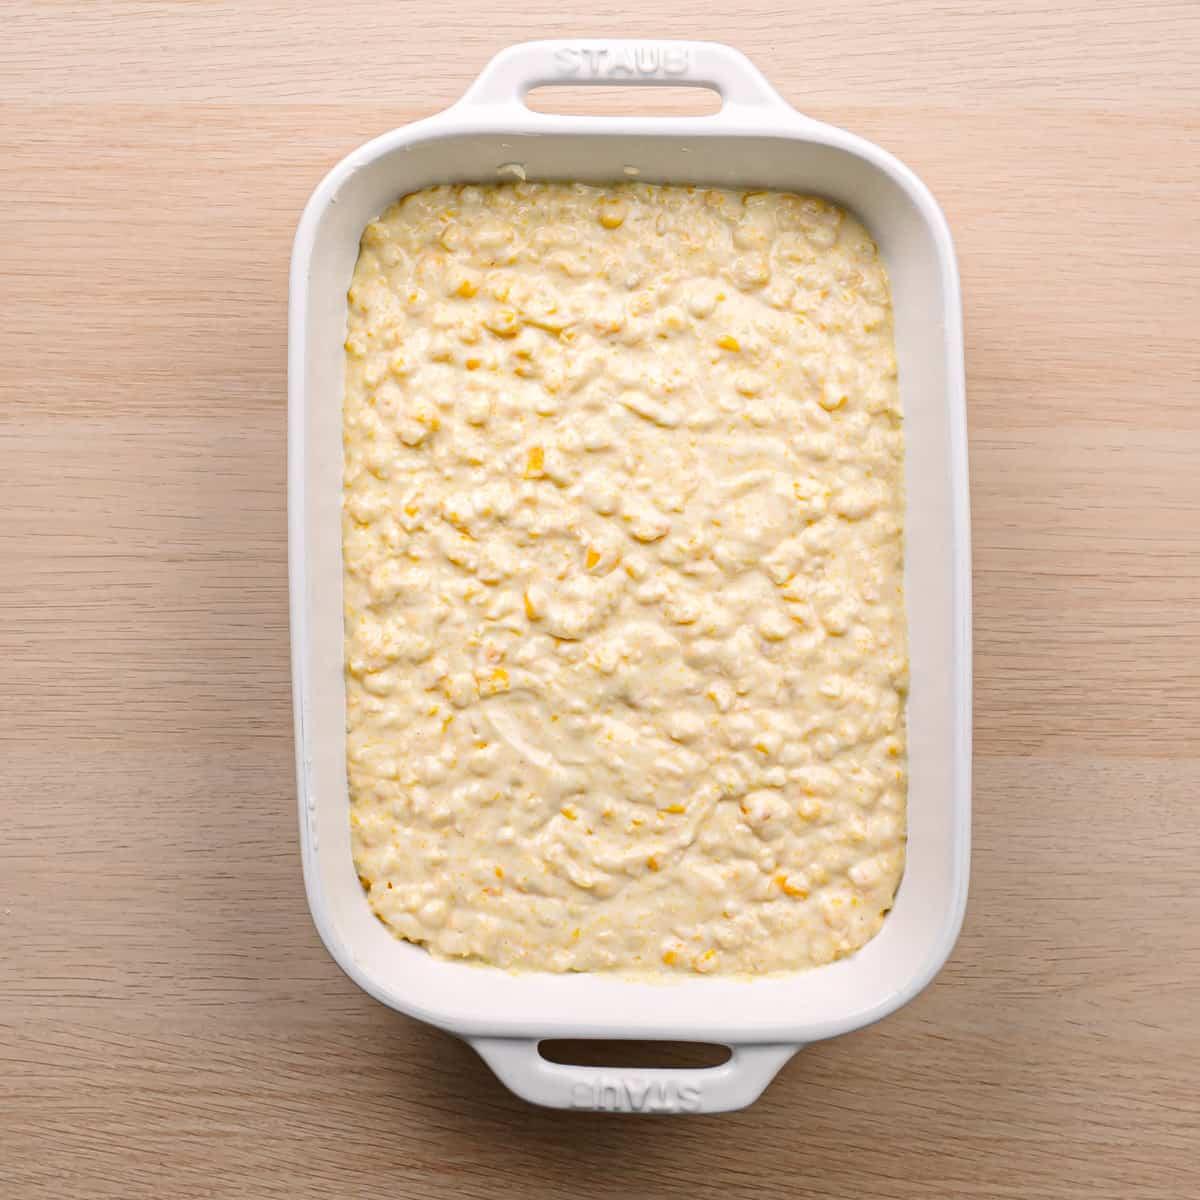 How to Bake Corn Casserole